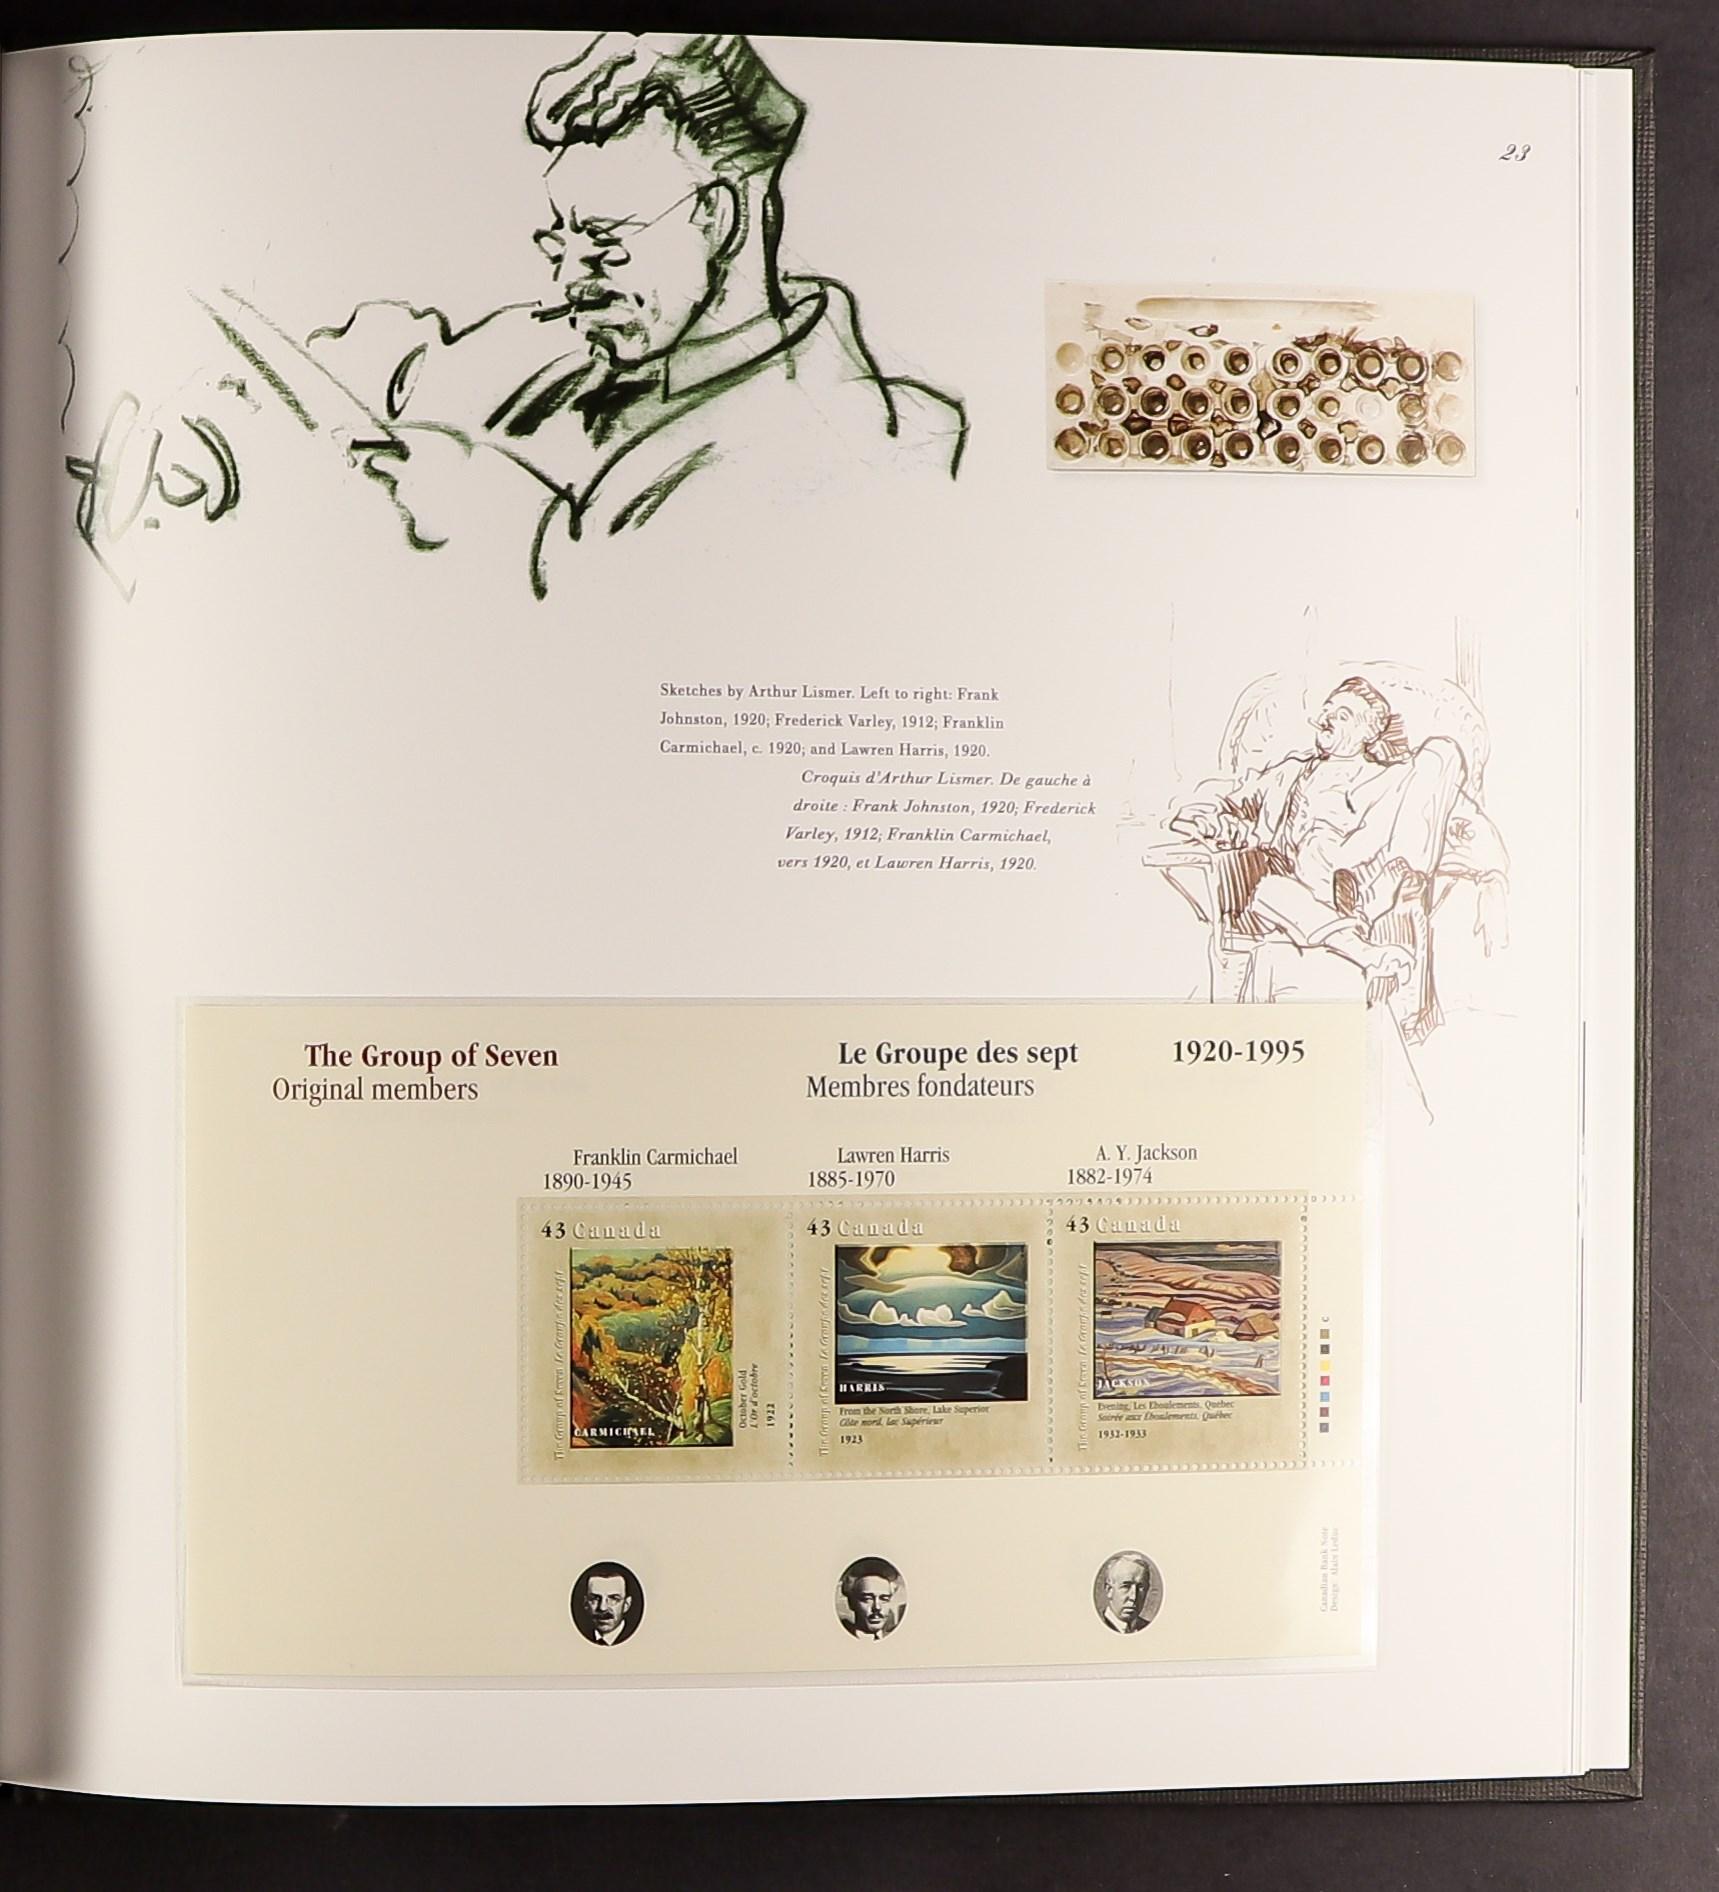 CANADA YEAR BOOKS 1976, 1978-82, 1984, 1986, 1987-99, fine. (21 books) - Image 3 of 3